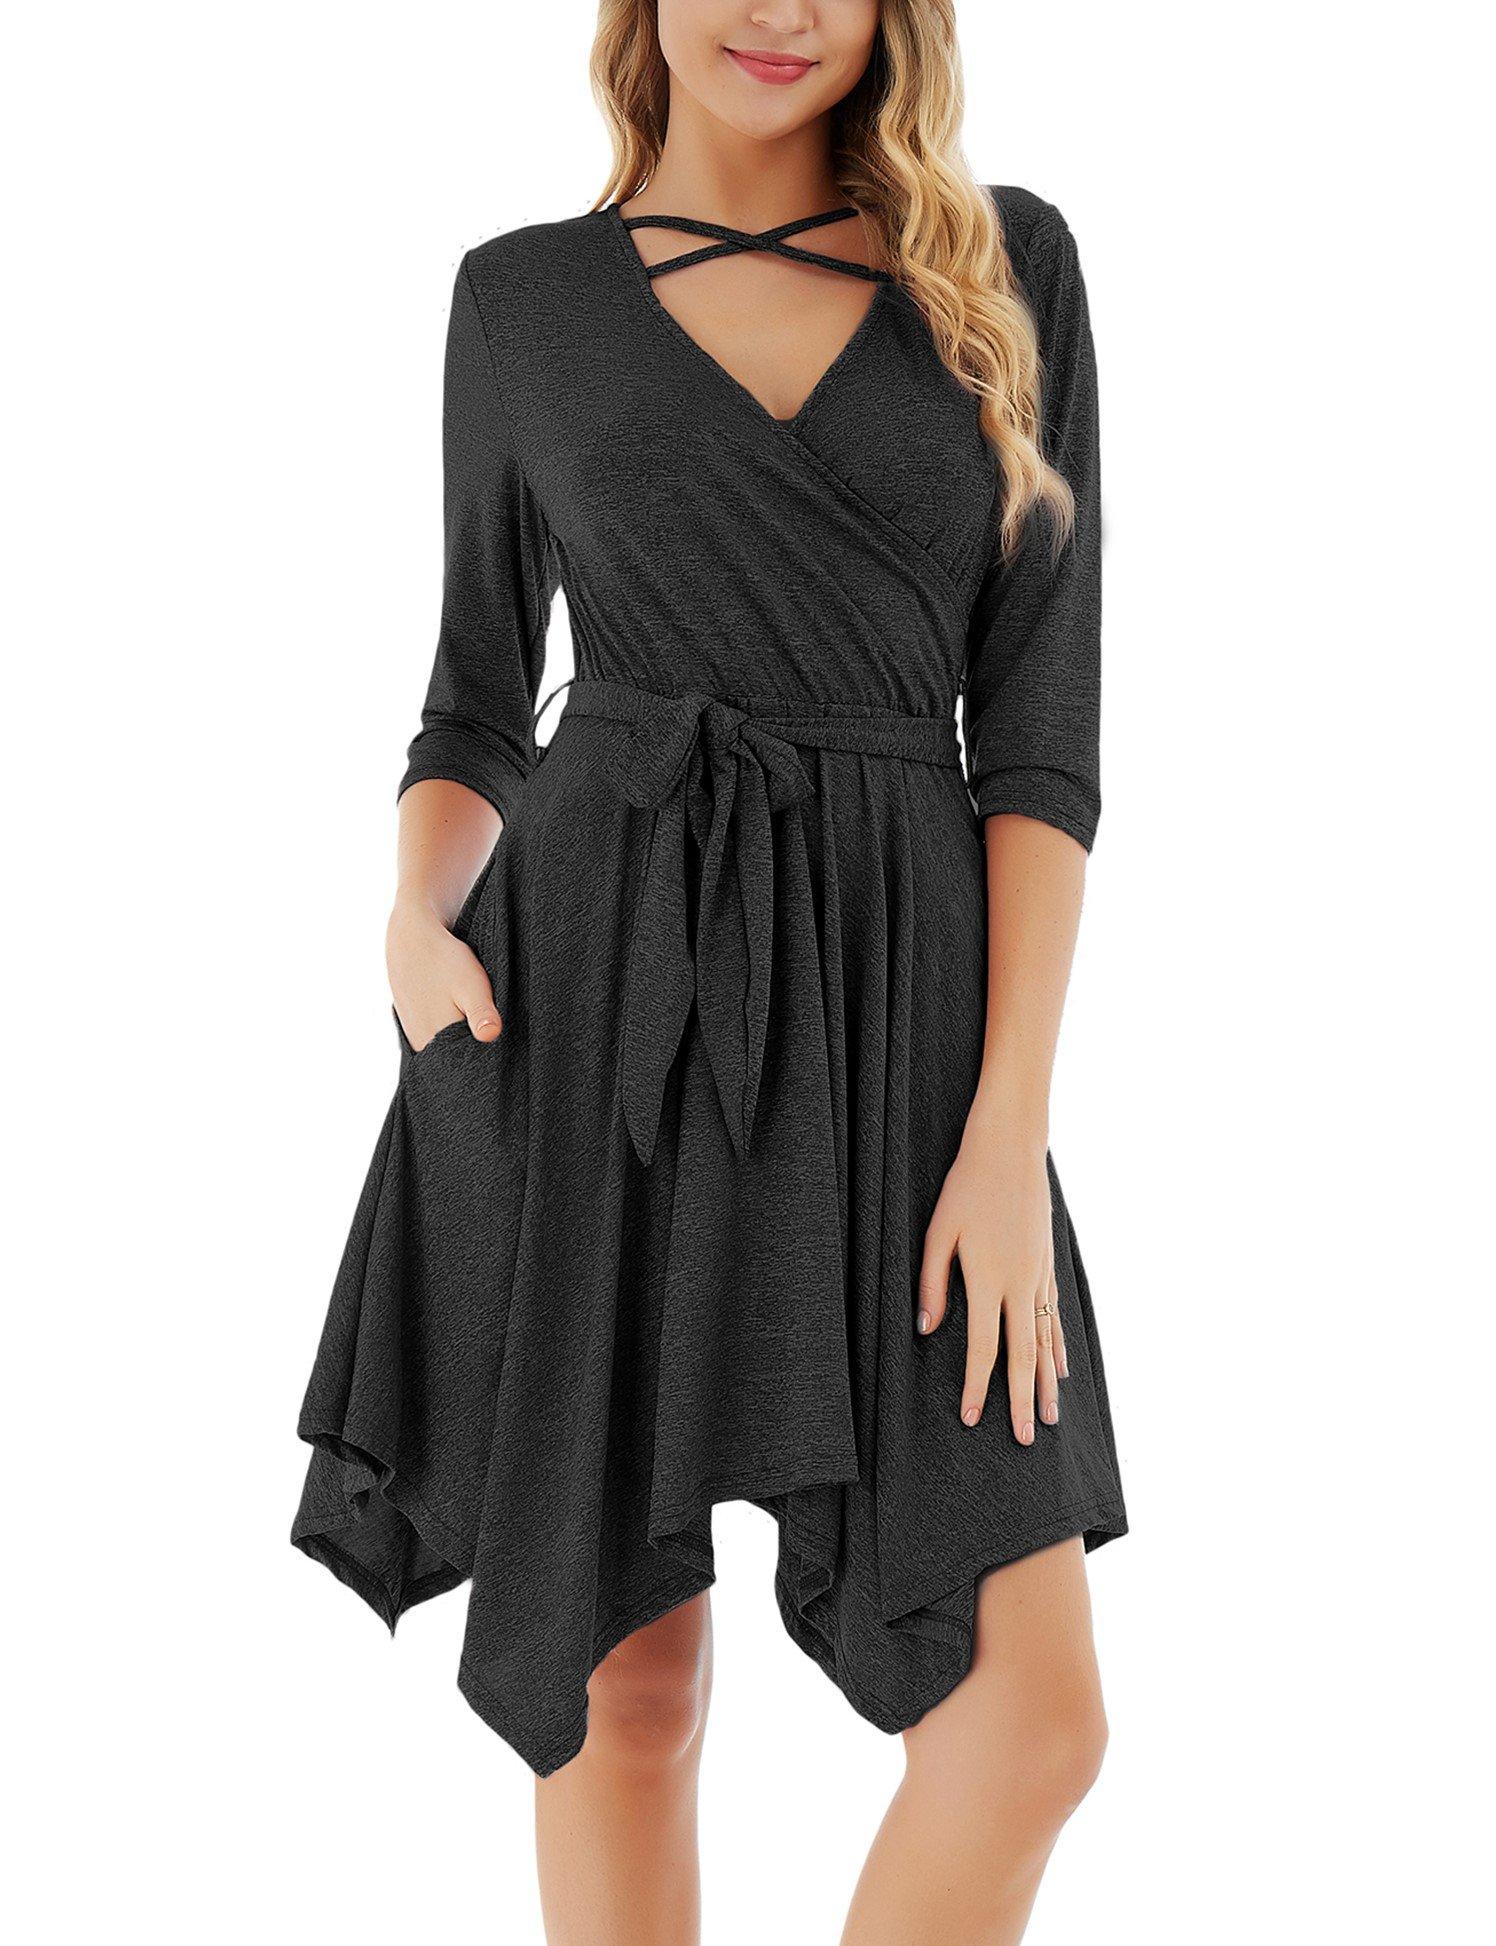 FISOUL Womens Tunic Dress Long Sleeve Criss Cross Casual Loose Party Swing Flared Midi Dress Black XL